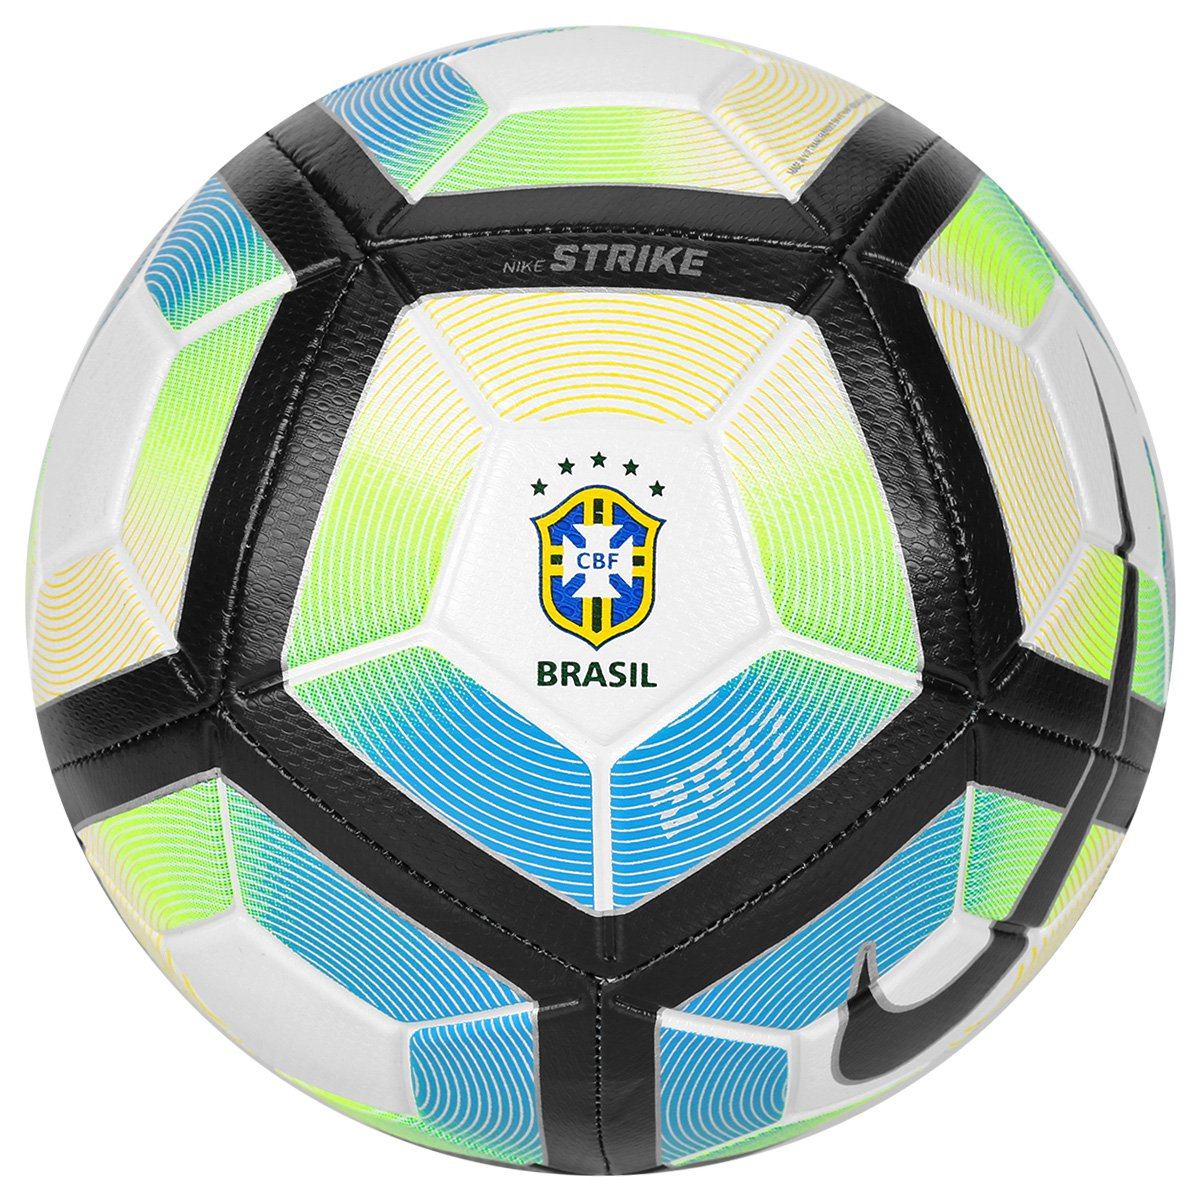 c92eb12a32f52 Bola Futebol Campo Nike Strike CBF - Compre Agora